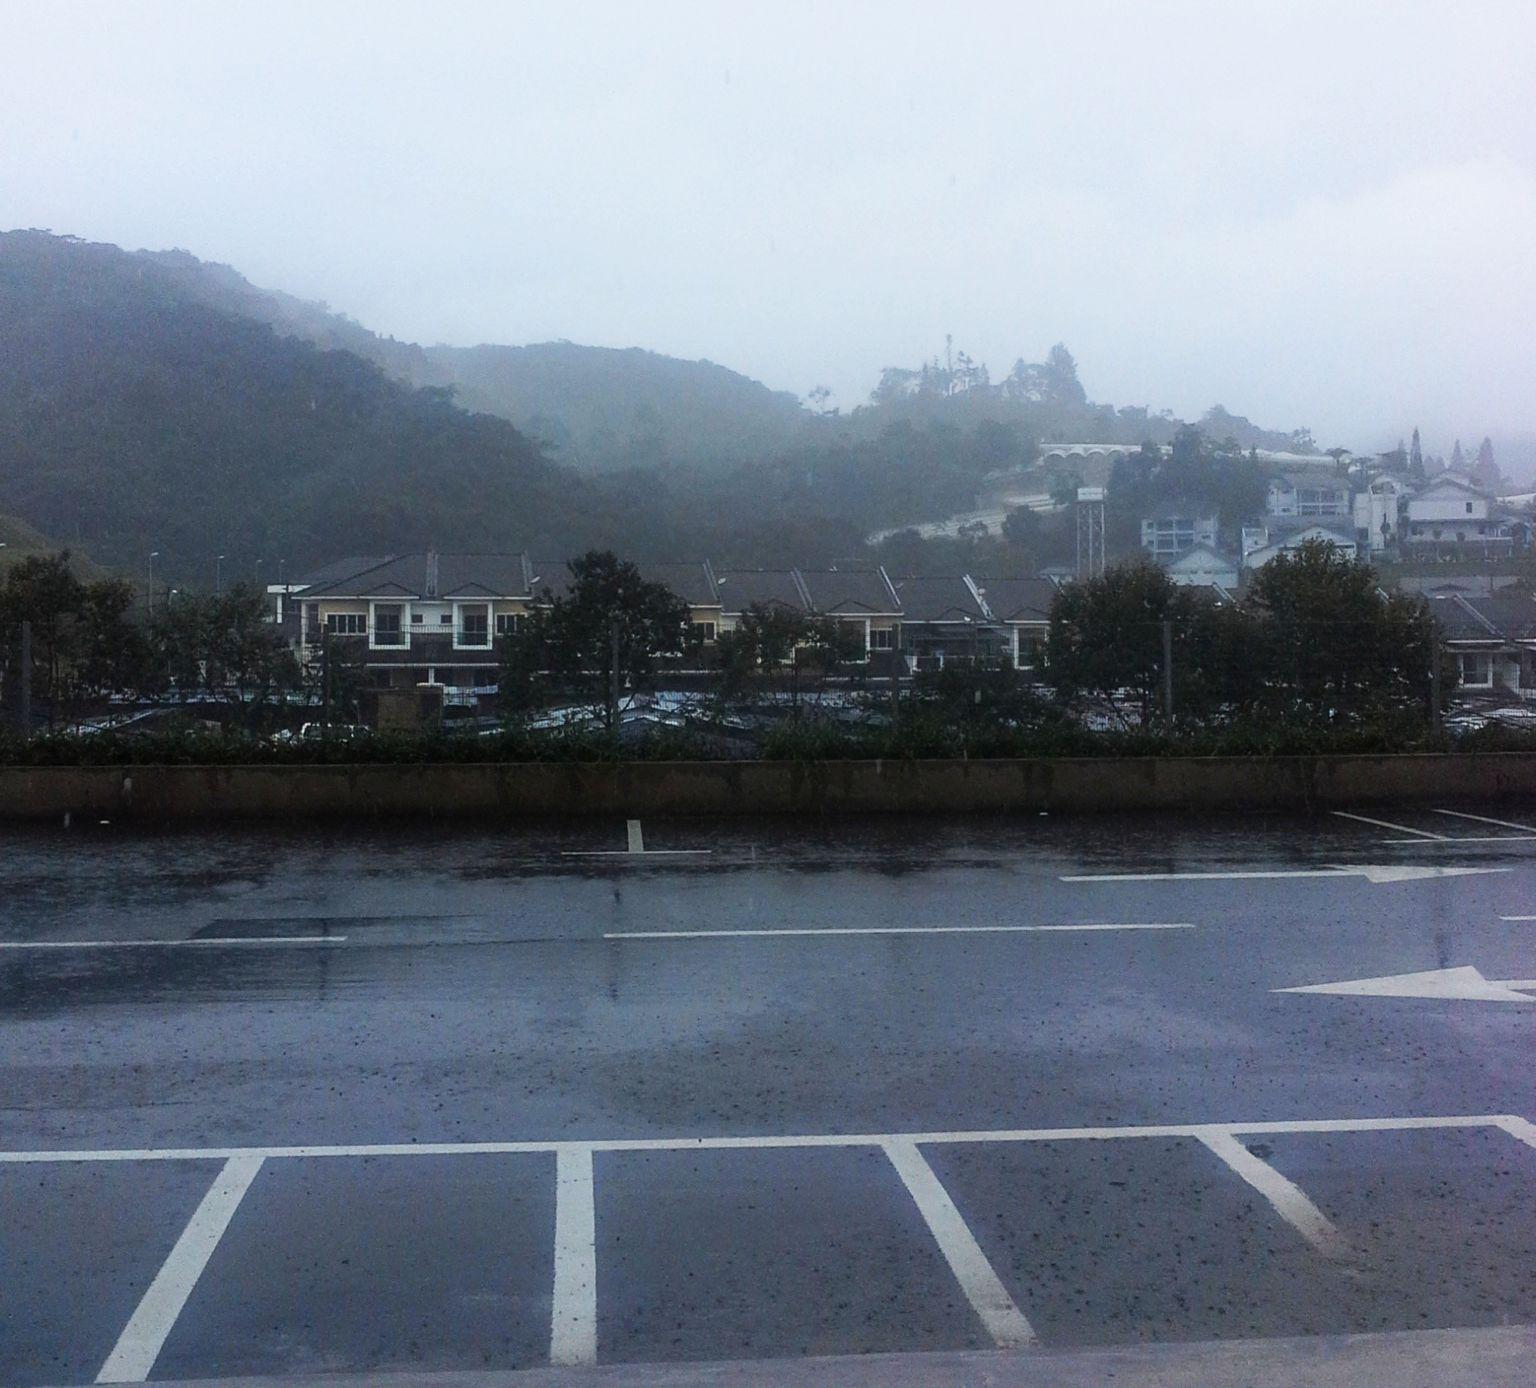 Raining at Cameron